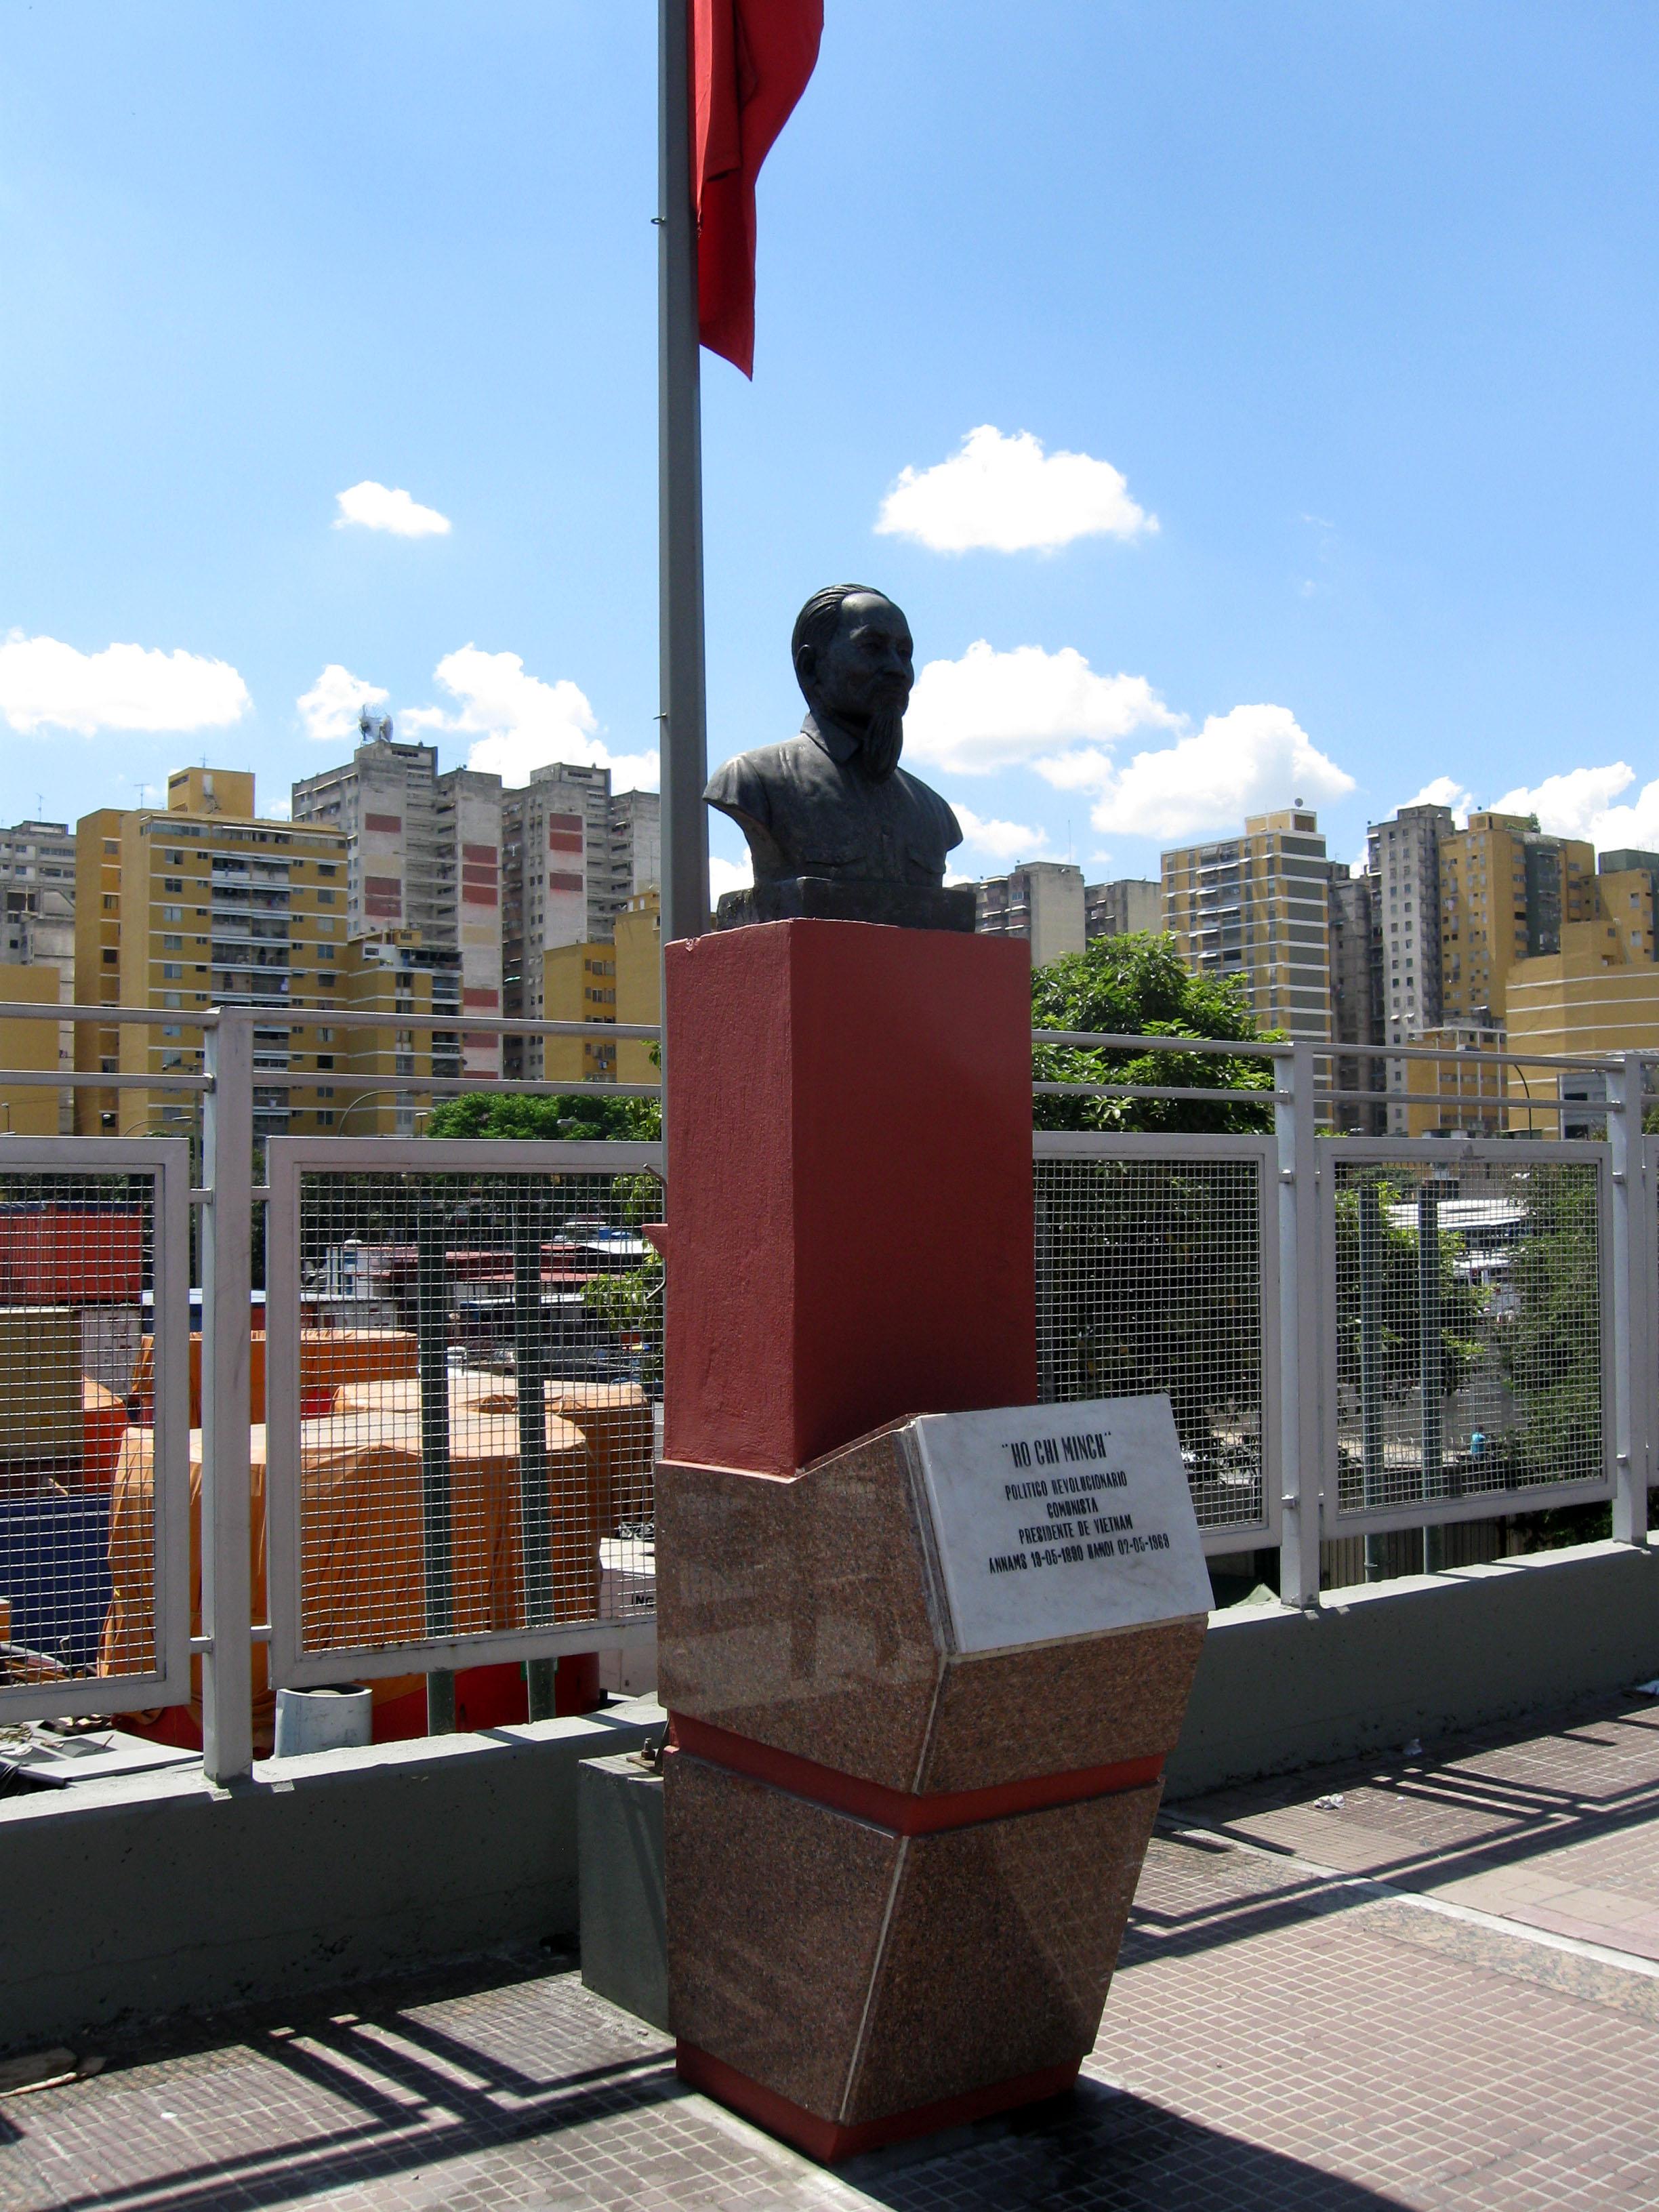 Busto de Hồ Chí Minh en Caracas, capital de Venezuela.